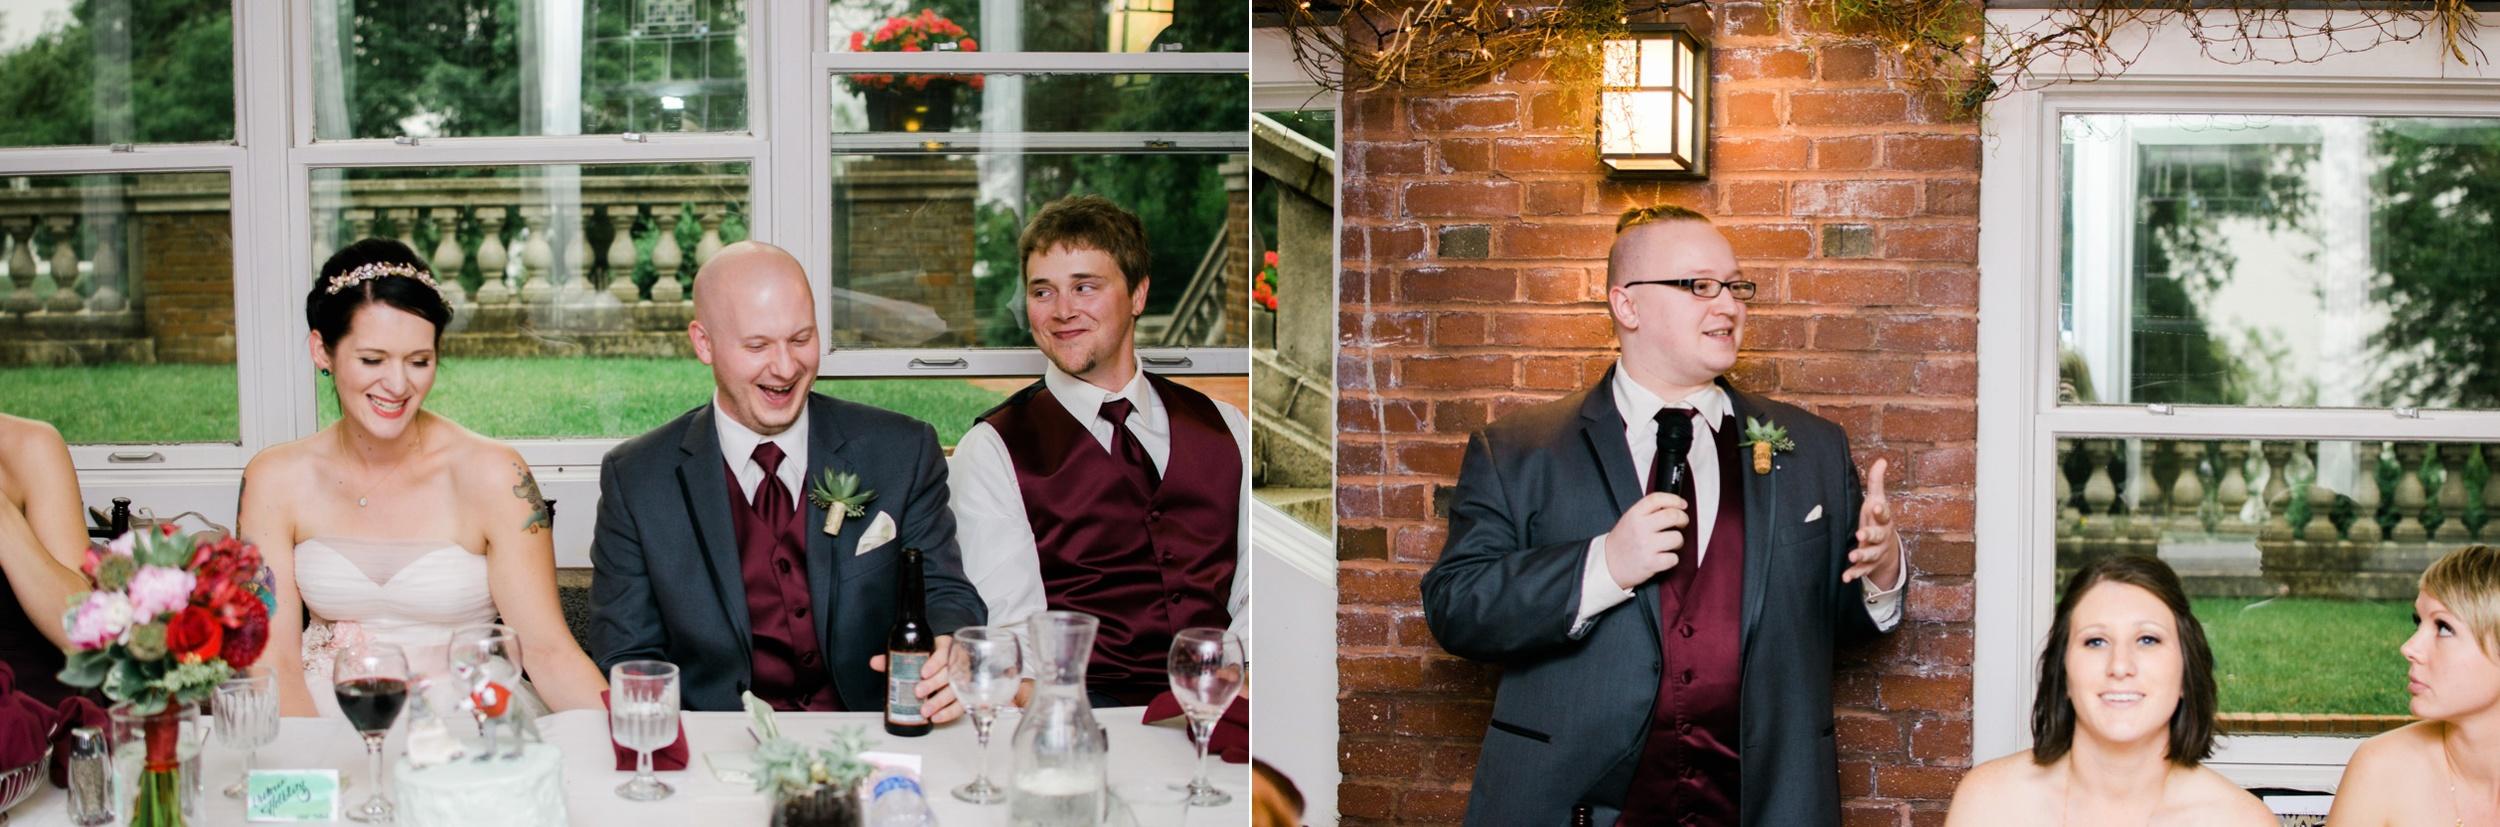 Glensheen Mansion Wedding | Duluth, MN Wedding Photographer_0520.jpg